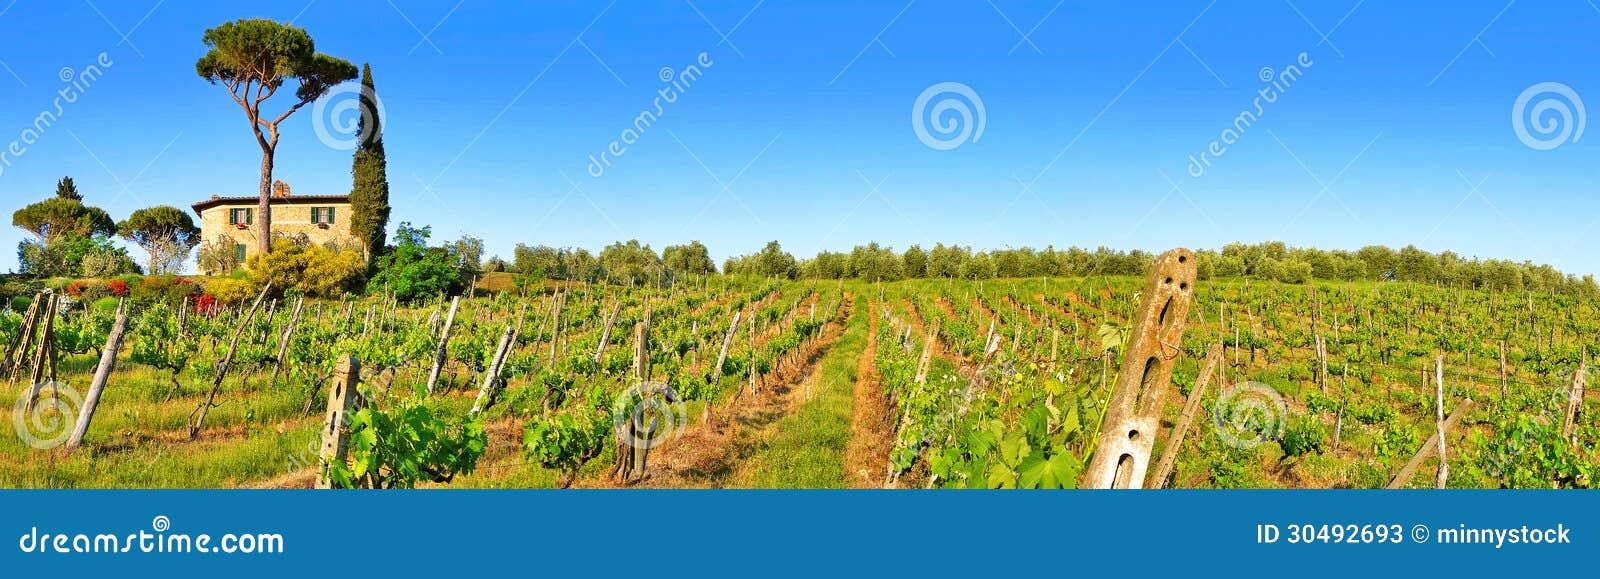 Tuscany landscape panorama with vineyard at sunset, Chianti region, Italy